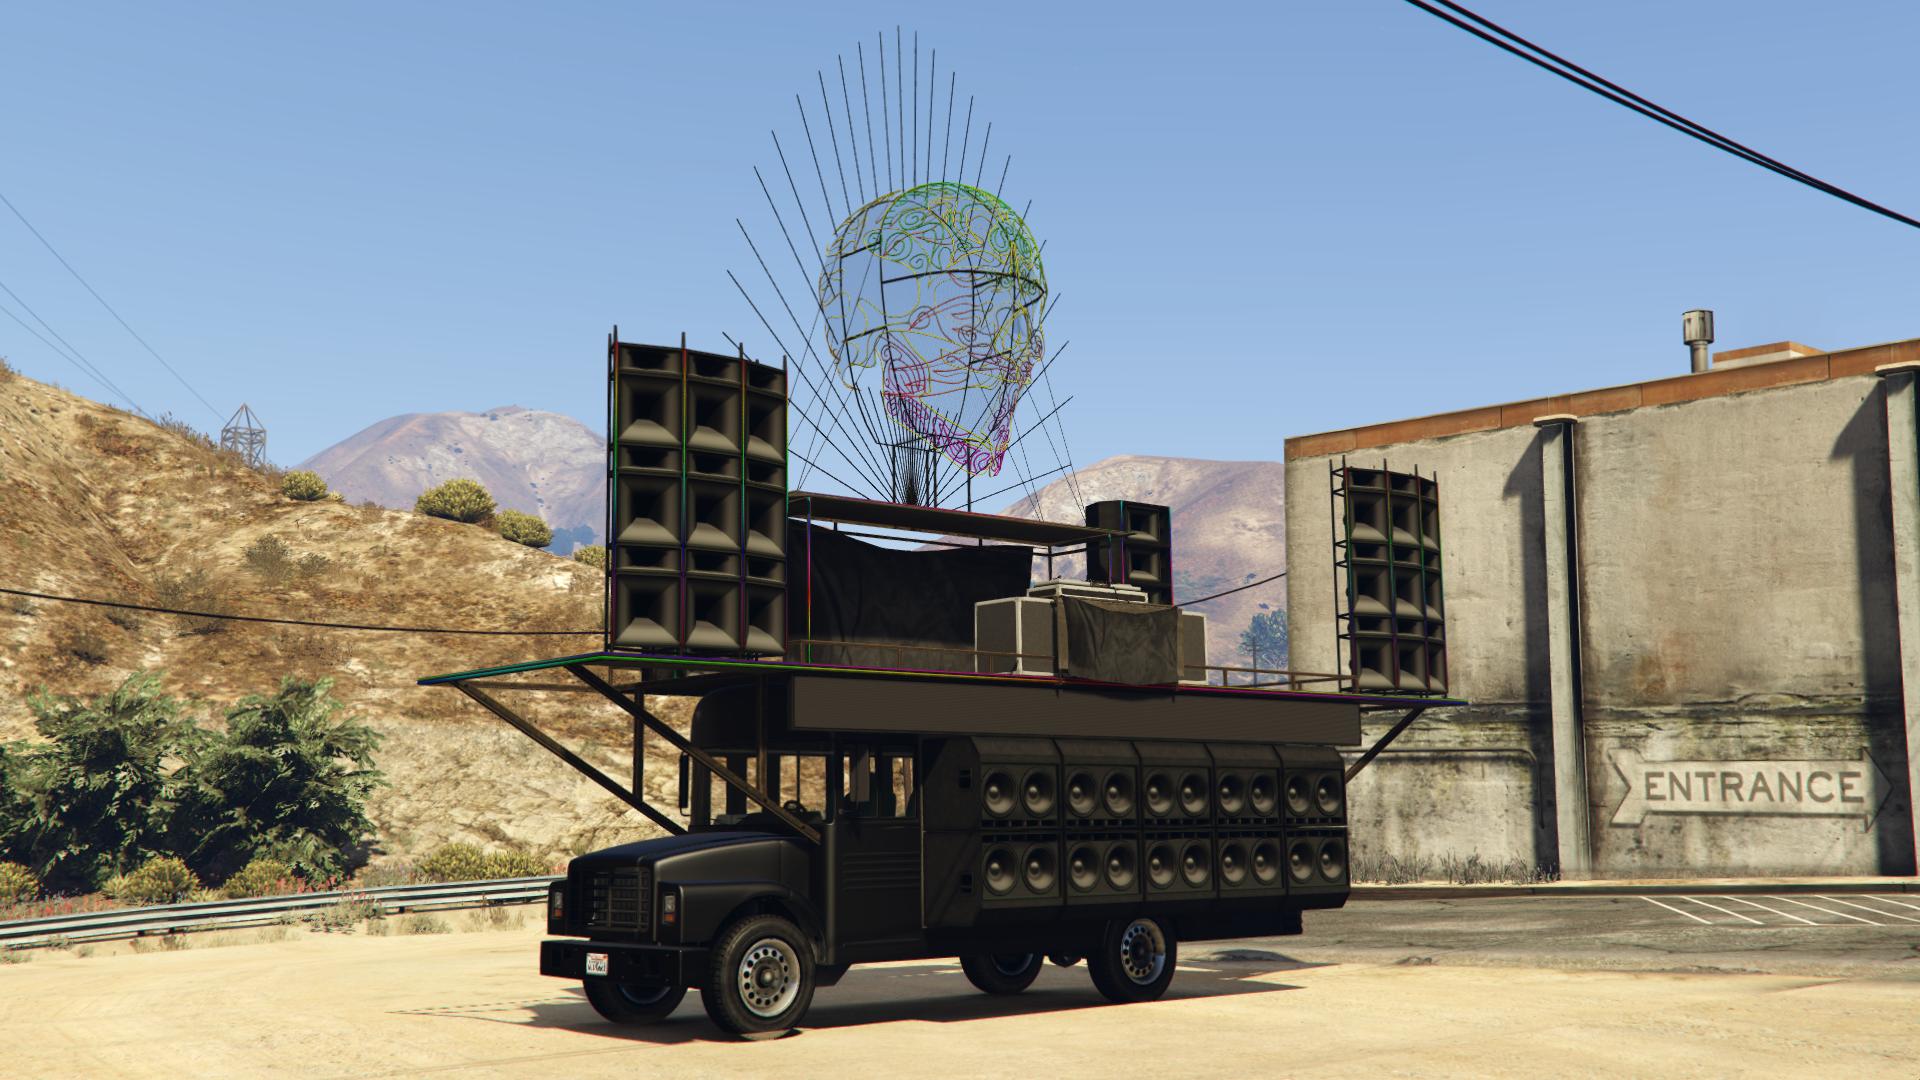 Pin by KingCobra on GTA V vehicles Gta, Gta 5, Gta online